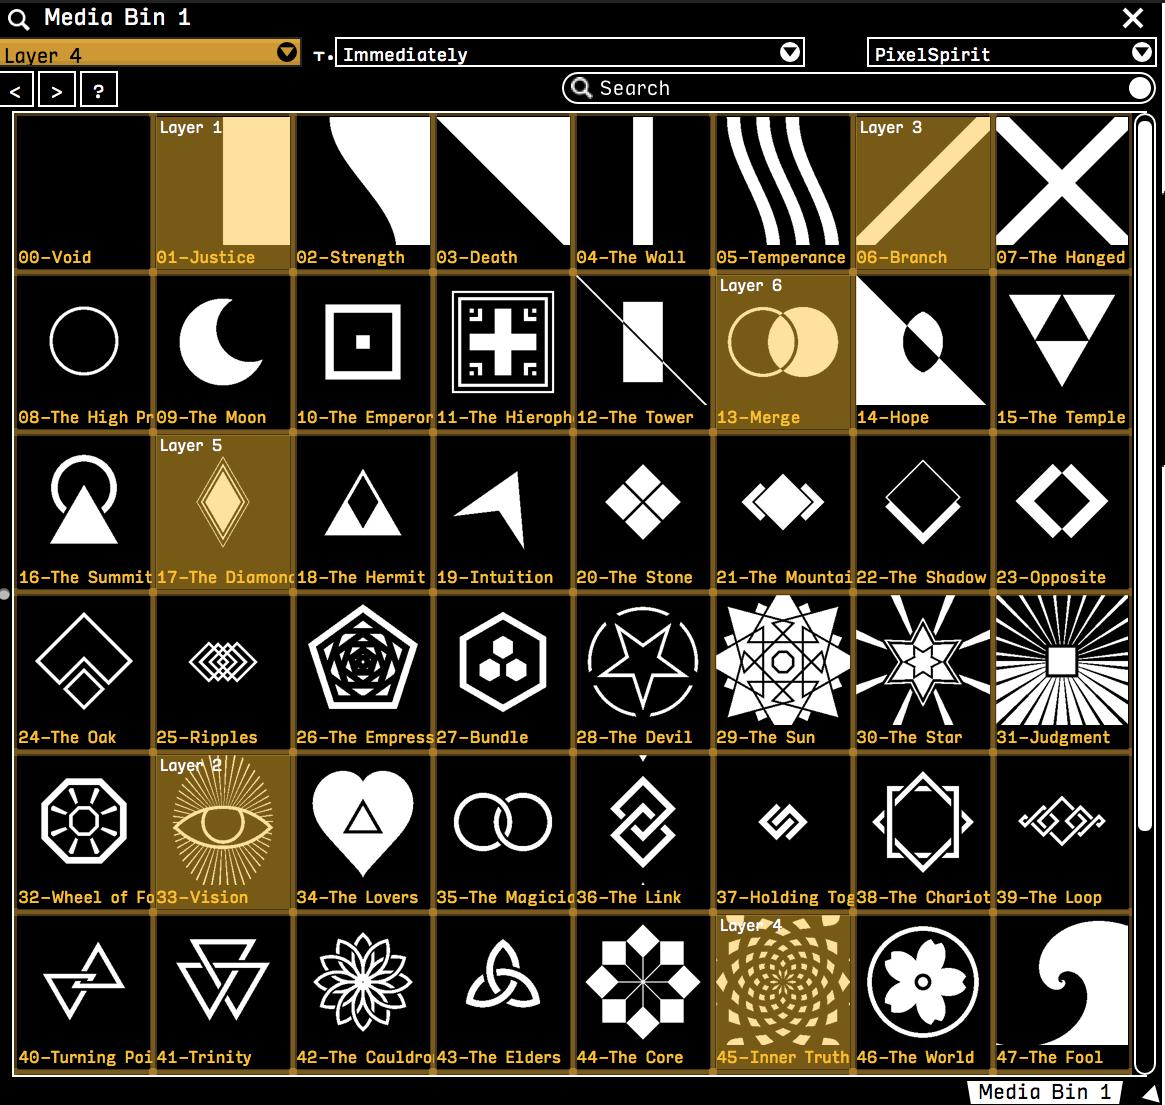 Pixel Spirit shaders loaded into a VDMX media bin